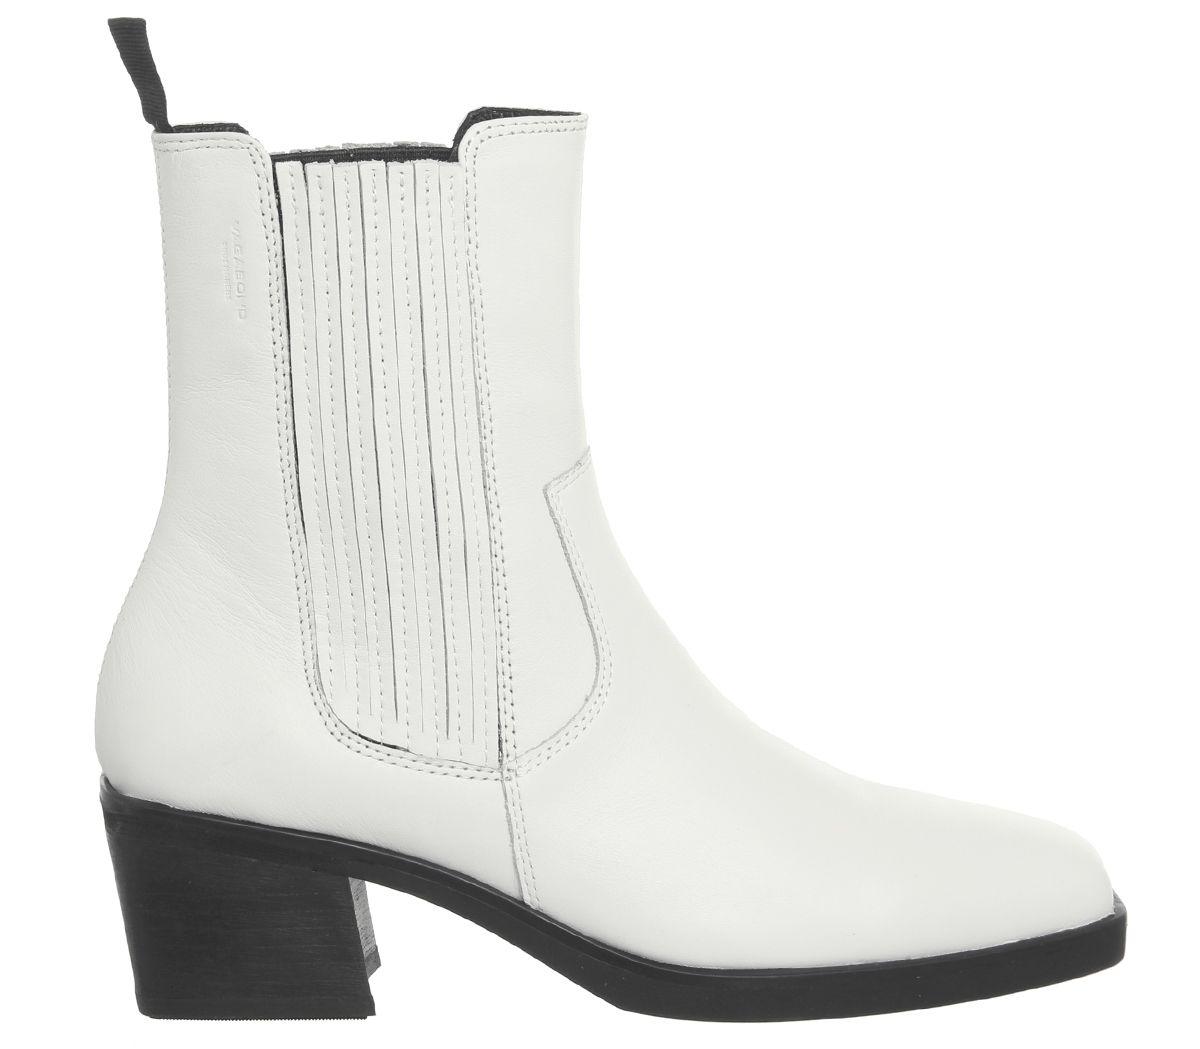 9c871913f9c Simone High Chelsea Boots